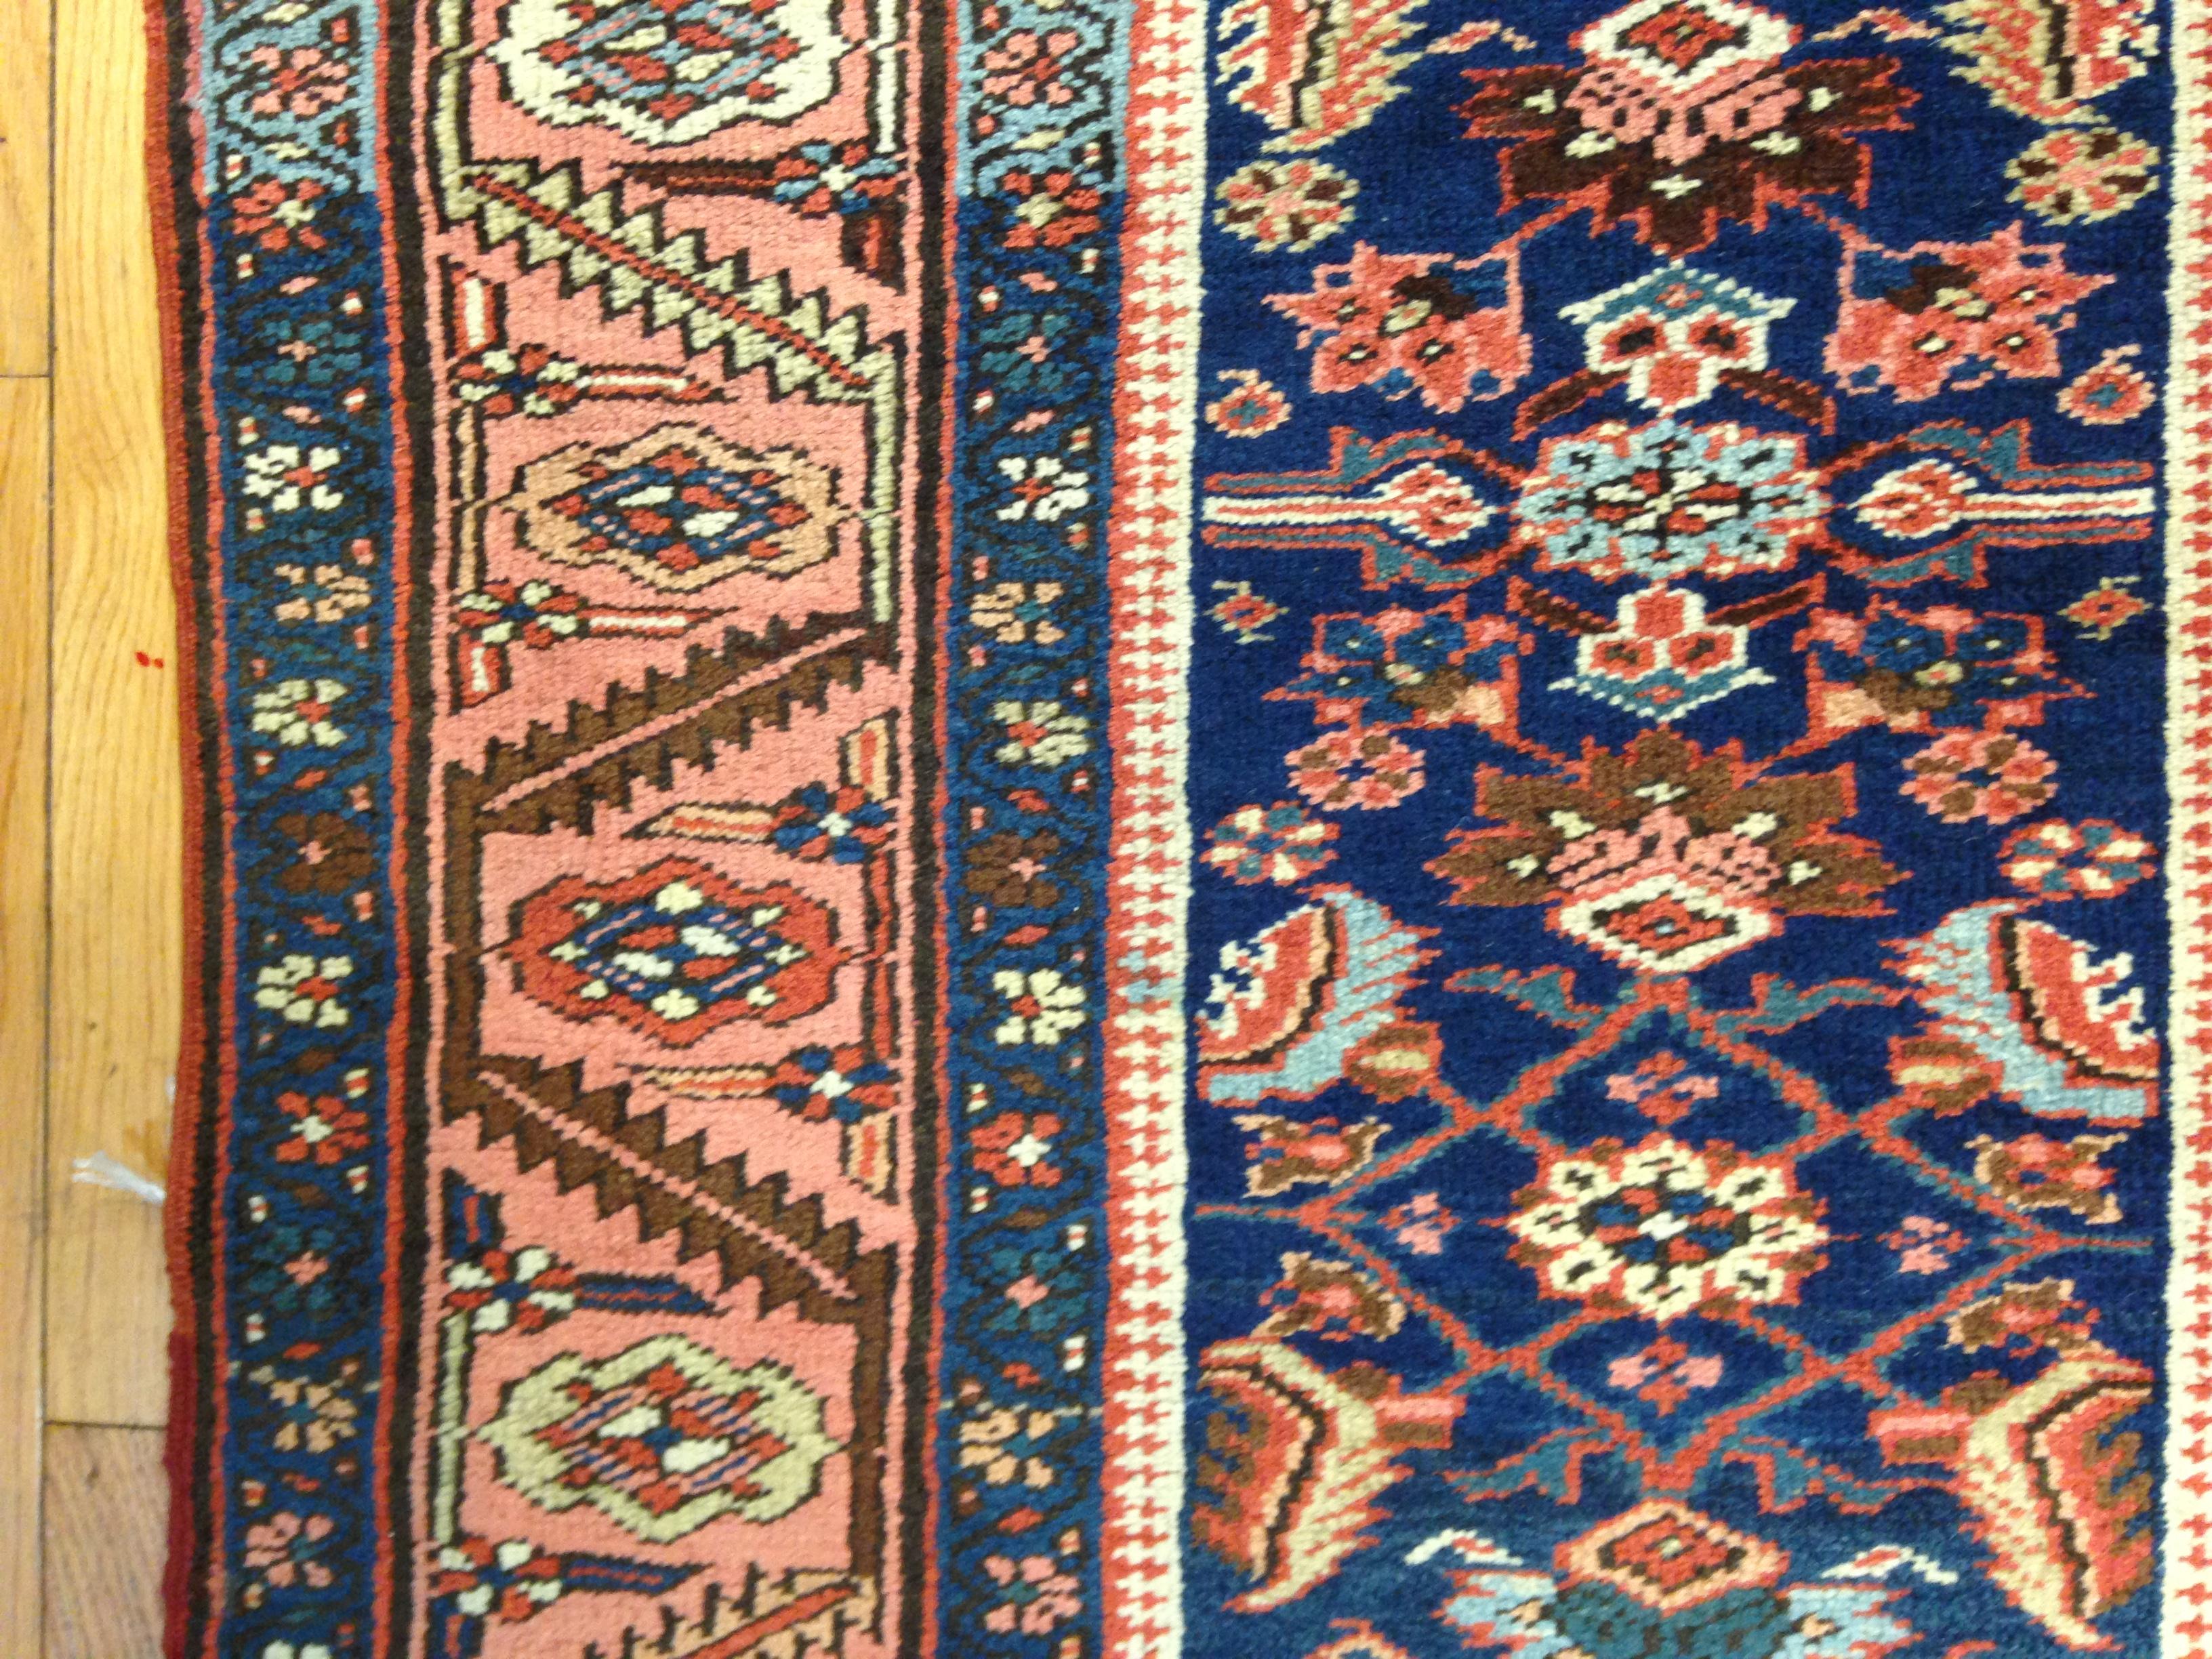 25052 antique Persian Bakshaish runner 3,2 x 17,4 -1